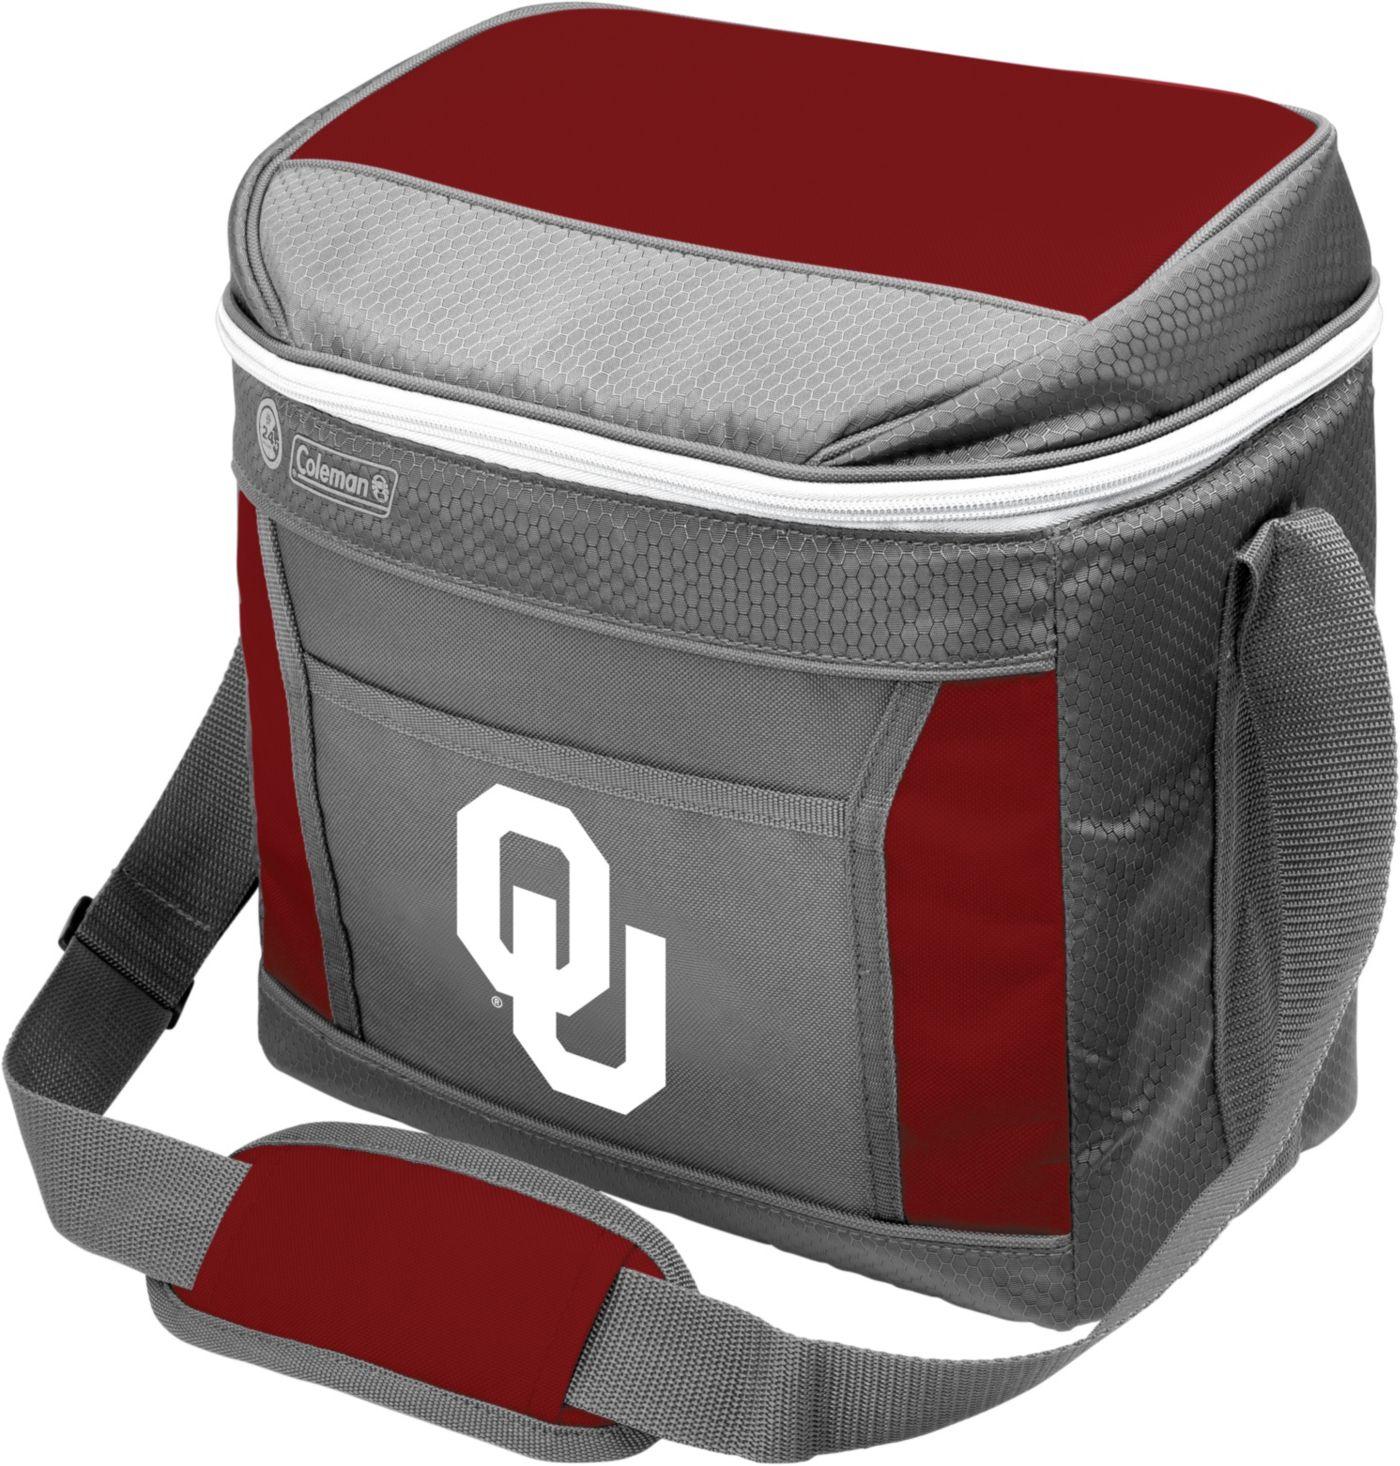 Rawlings Oklahoma Sooners 16-Can Cooler